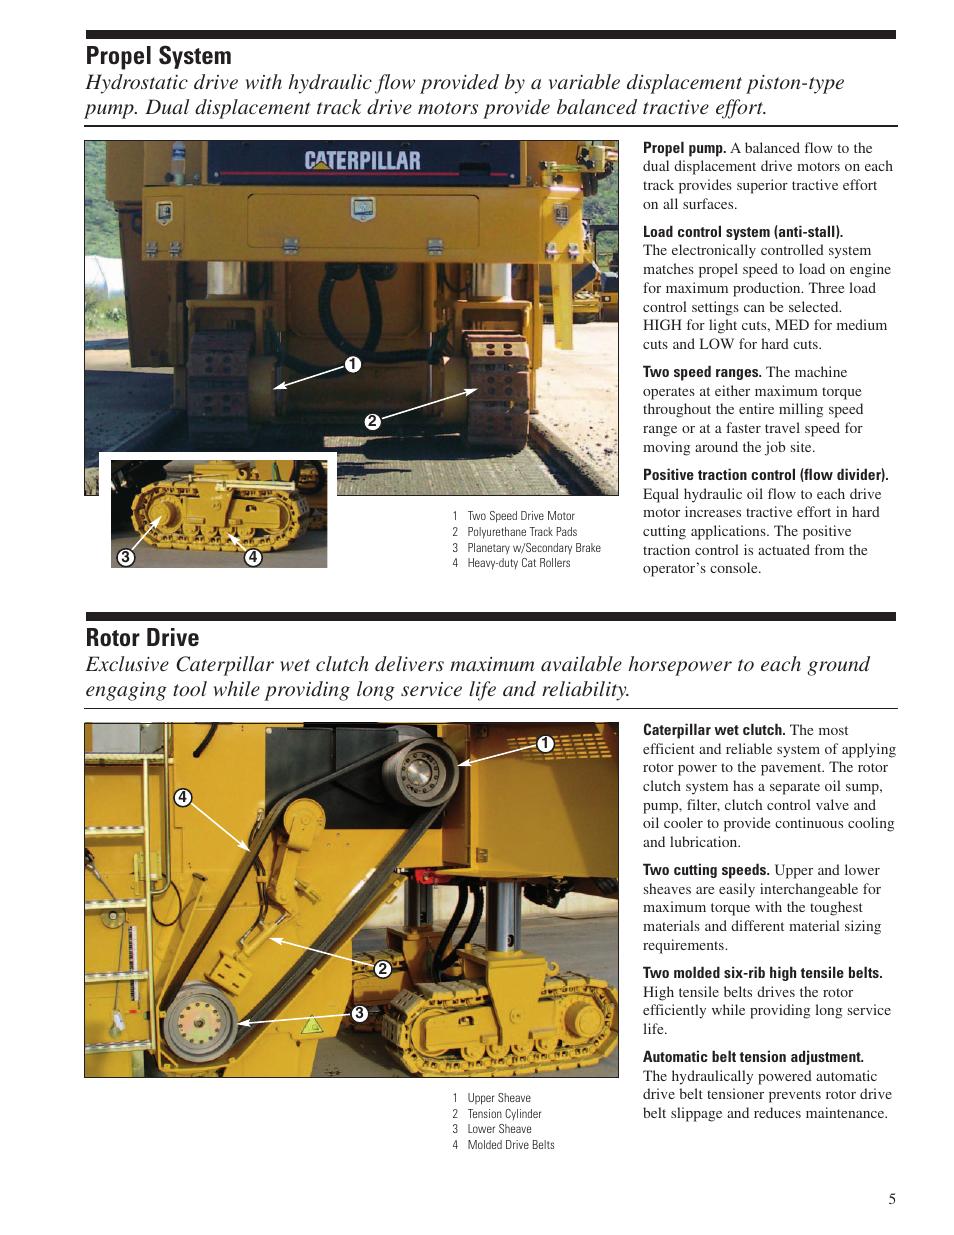 Propel system, Rotor drive | Milton CAT PM 200 User Manual